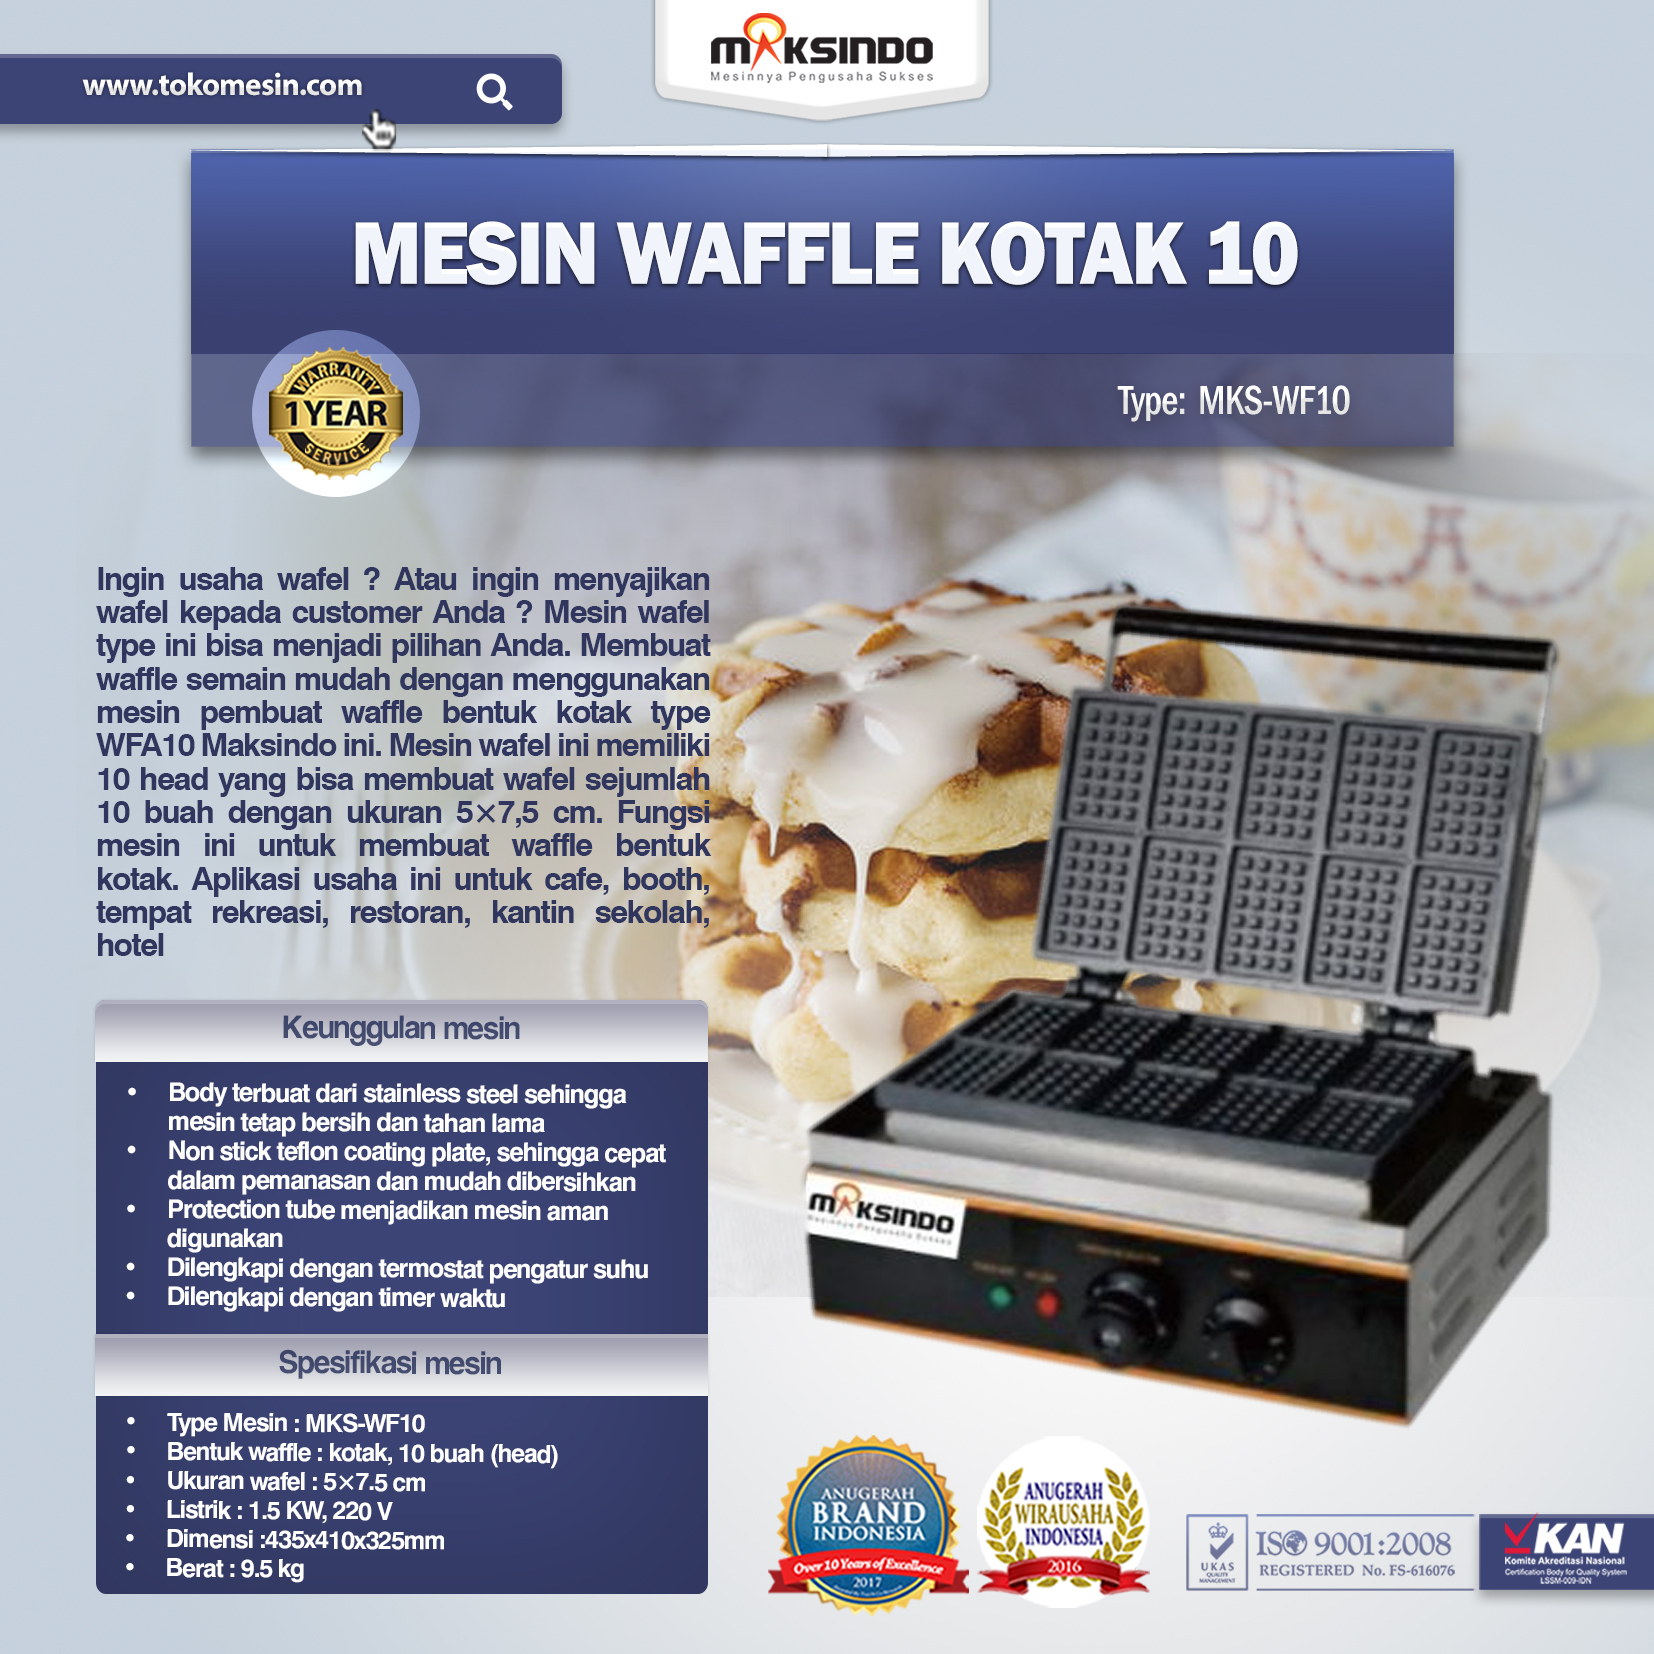 Mesin Waffle Kotak 10 (MKS-WF10)